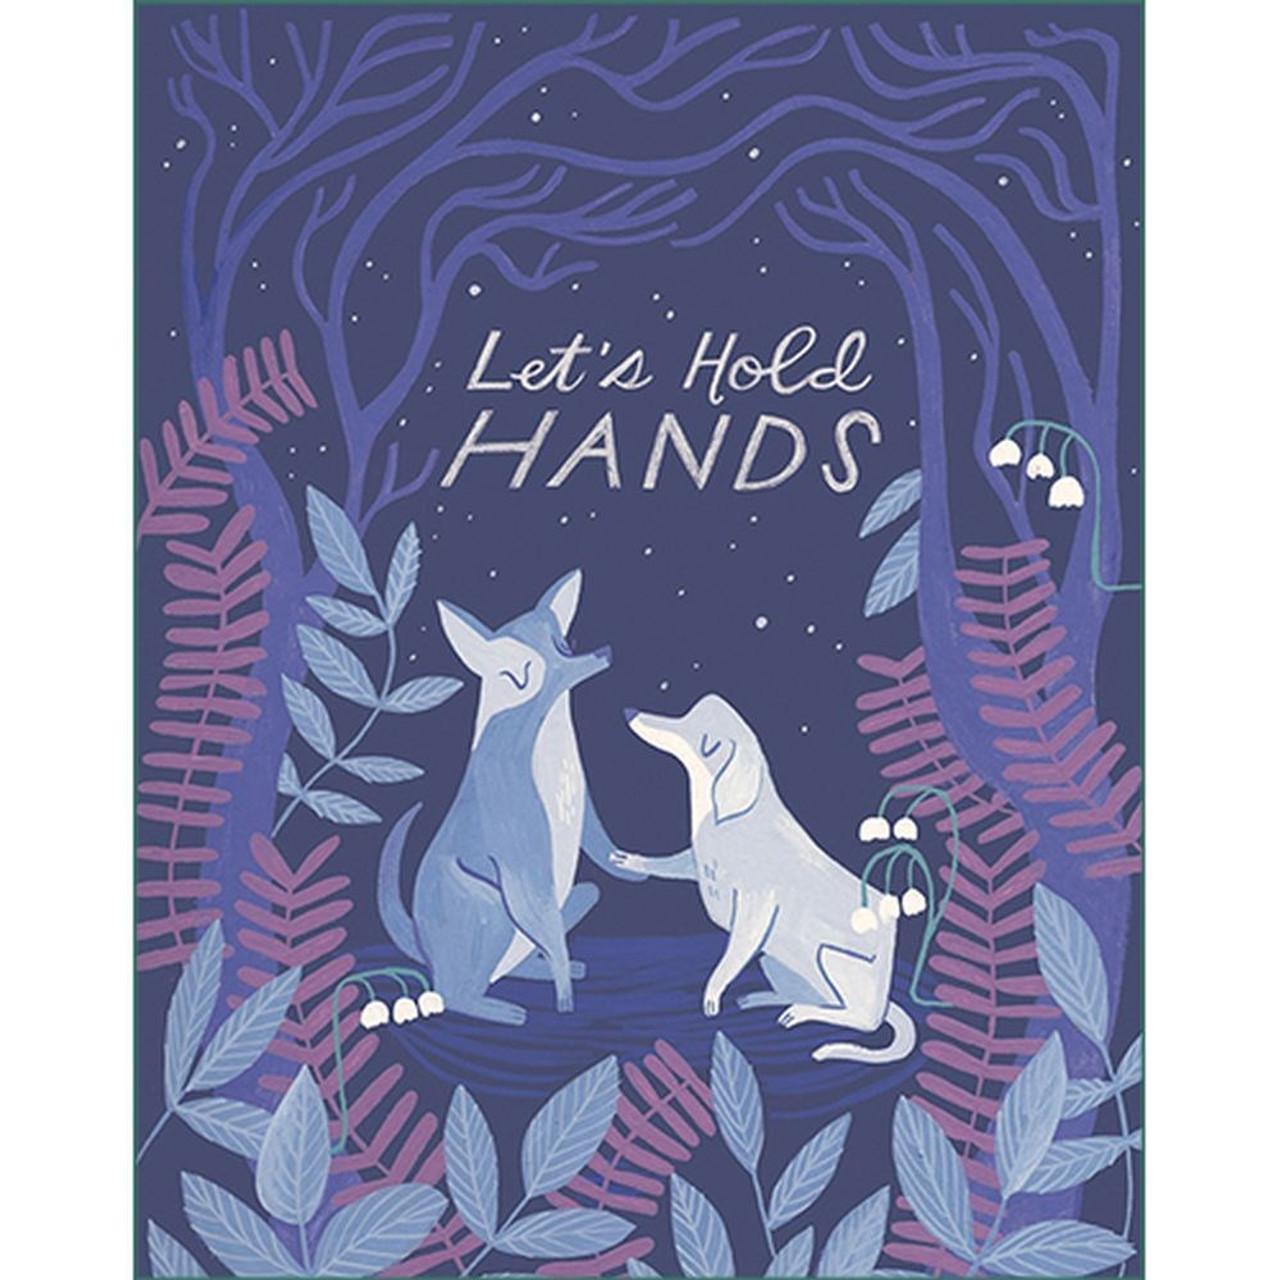 Let's hold hands Encouragement Card